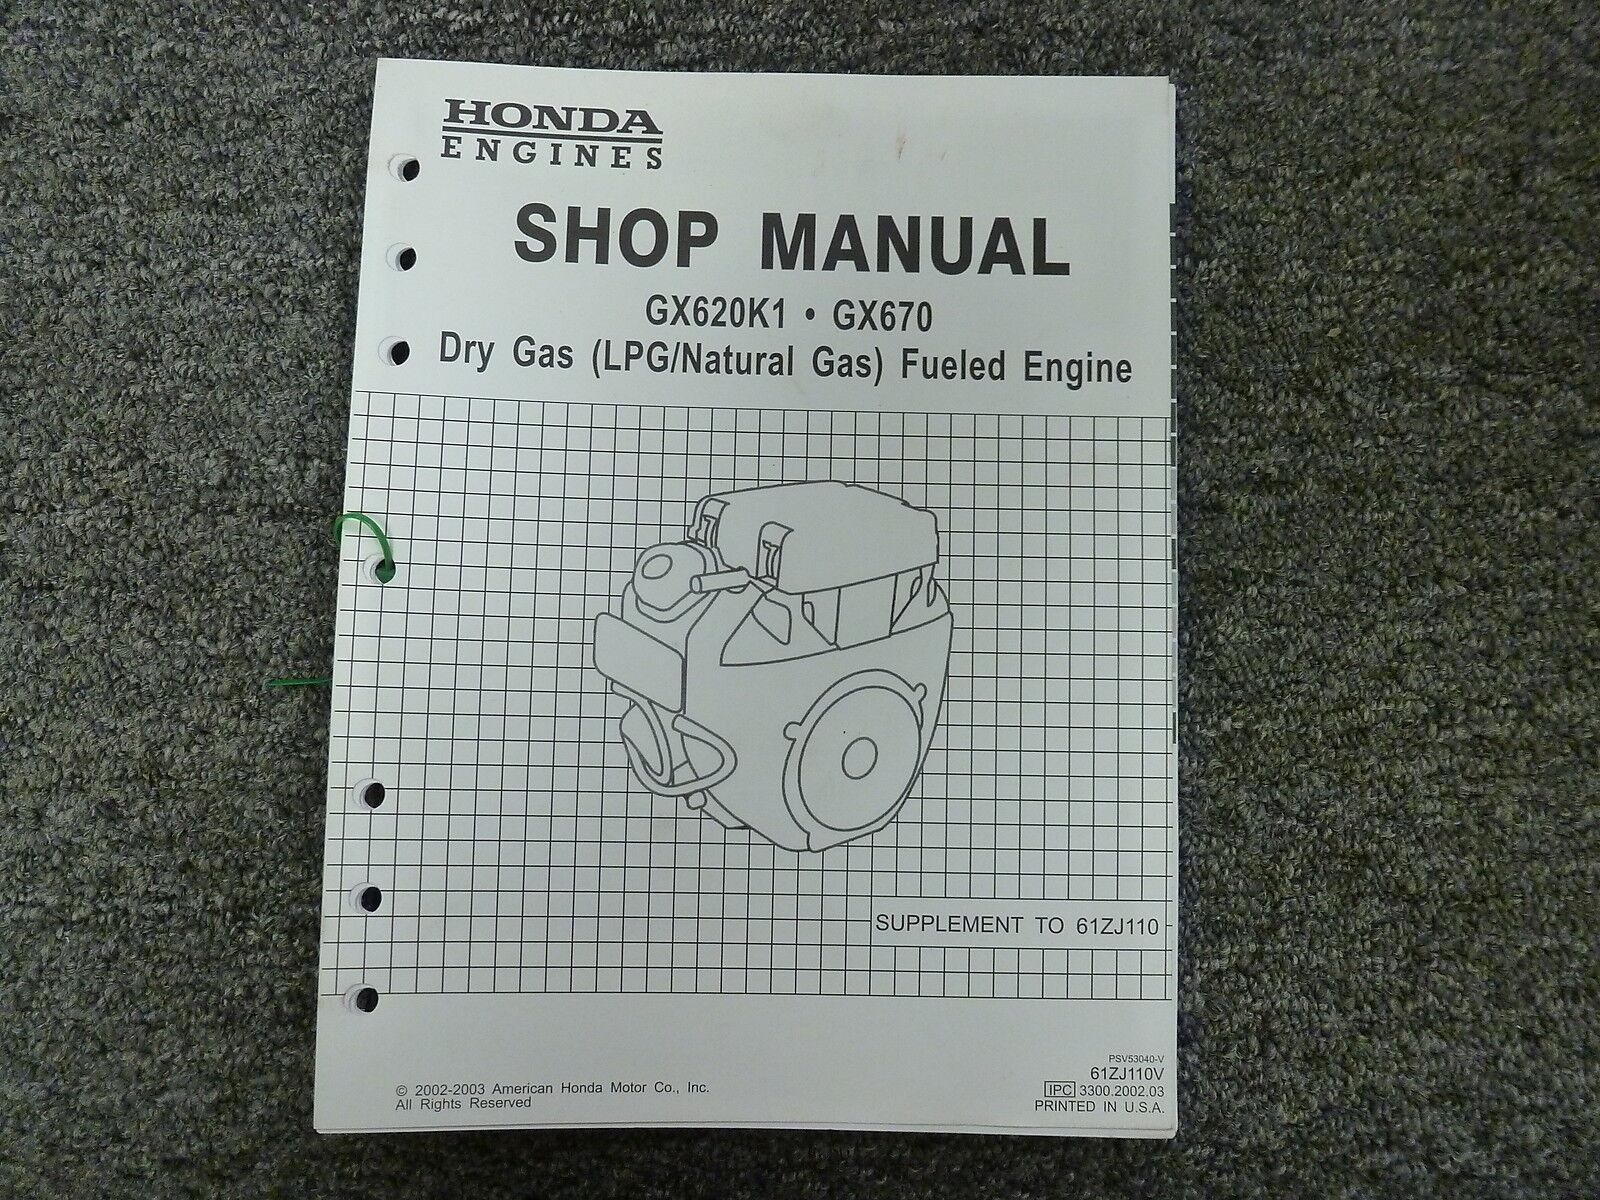 Honda Gx620 620 K1 Dry Gas Engine Service Repair Shop Manual Ebay Gx670 Wiring Diagram Norton Secured Powered By Verisign